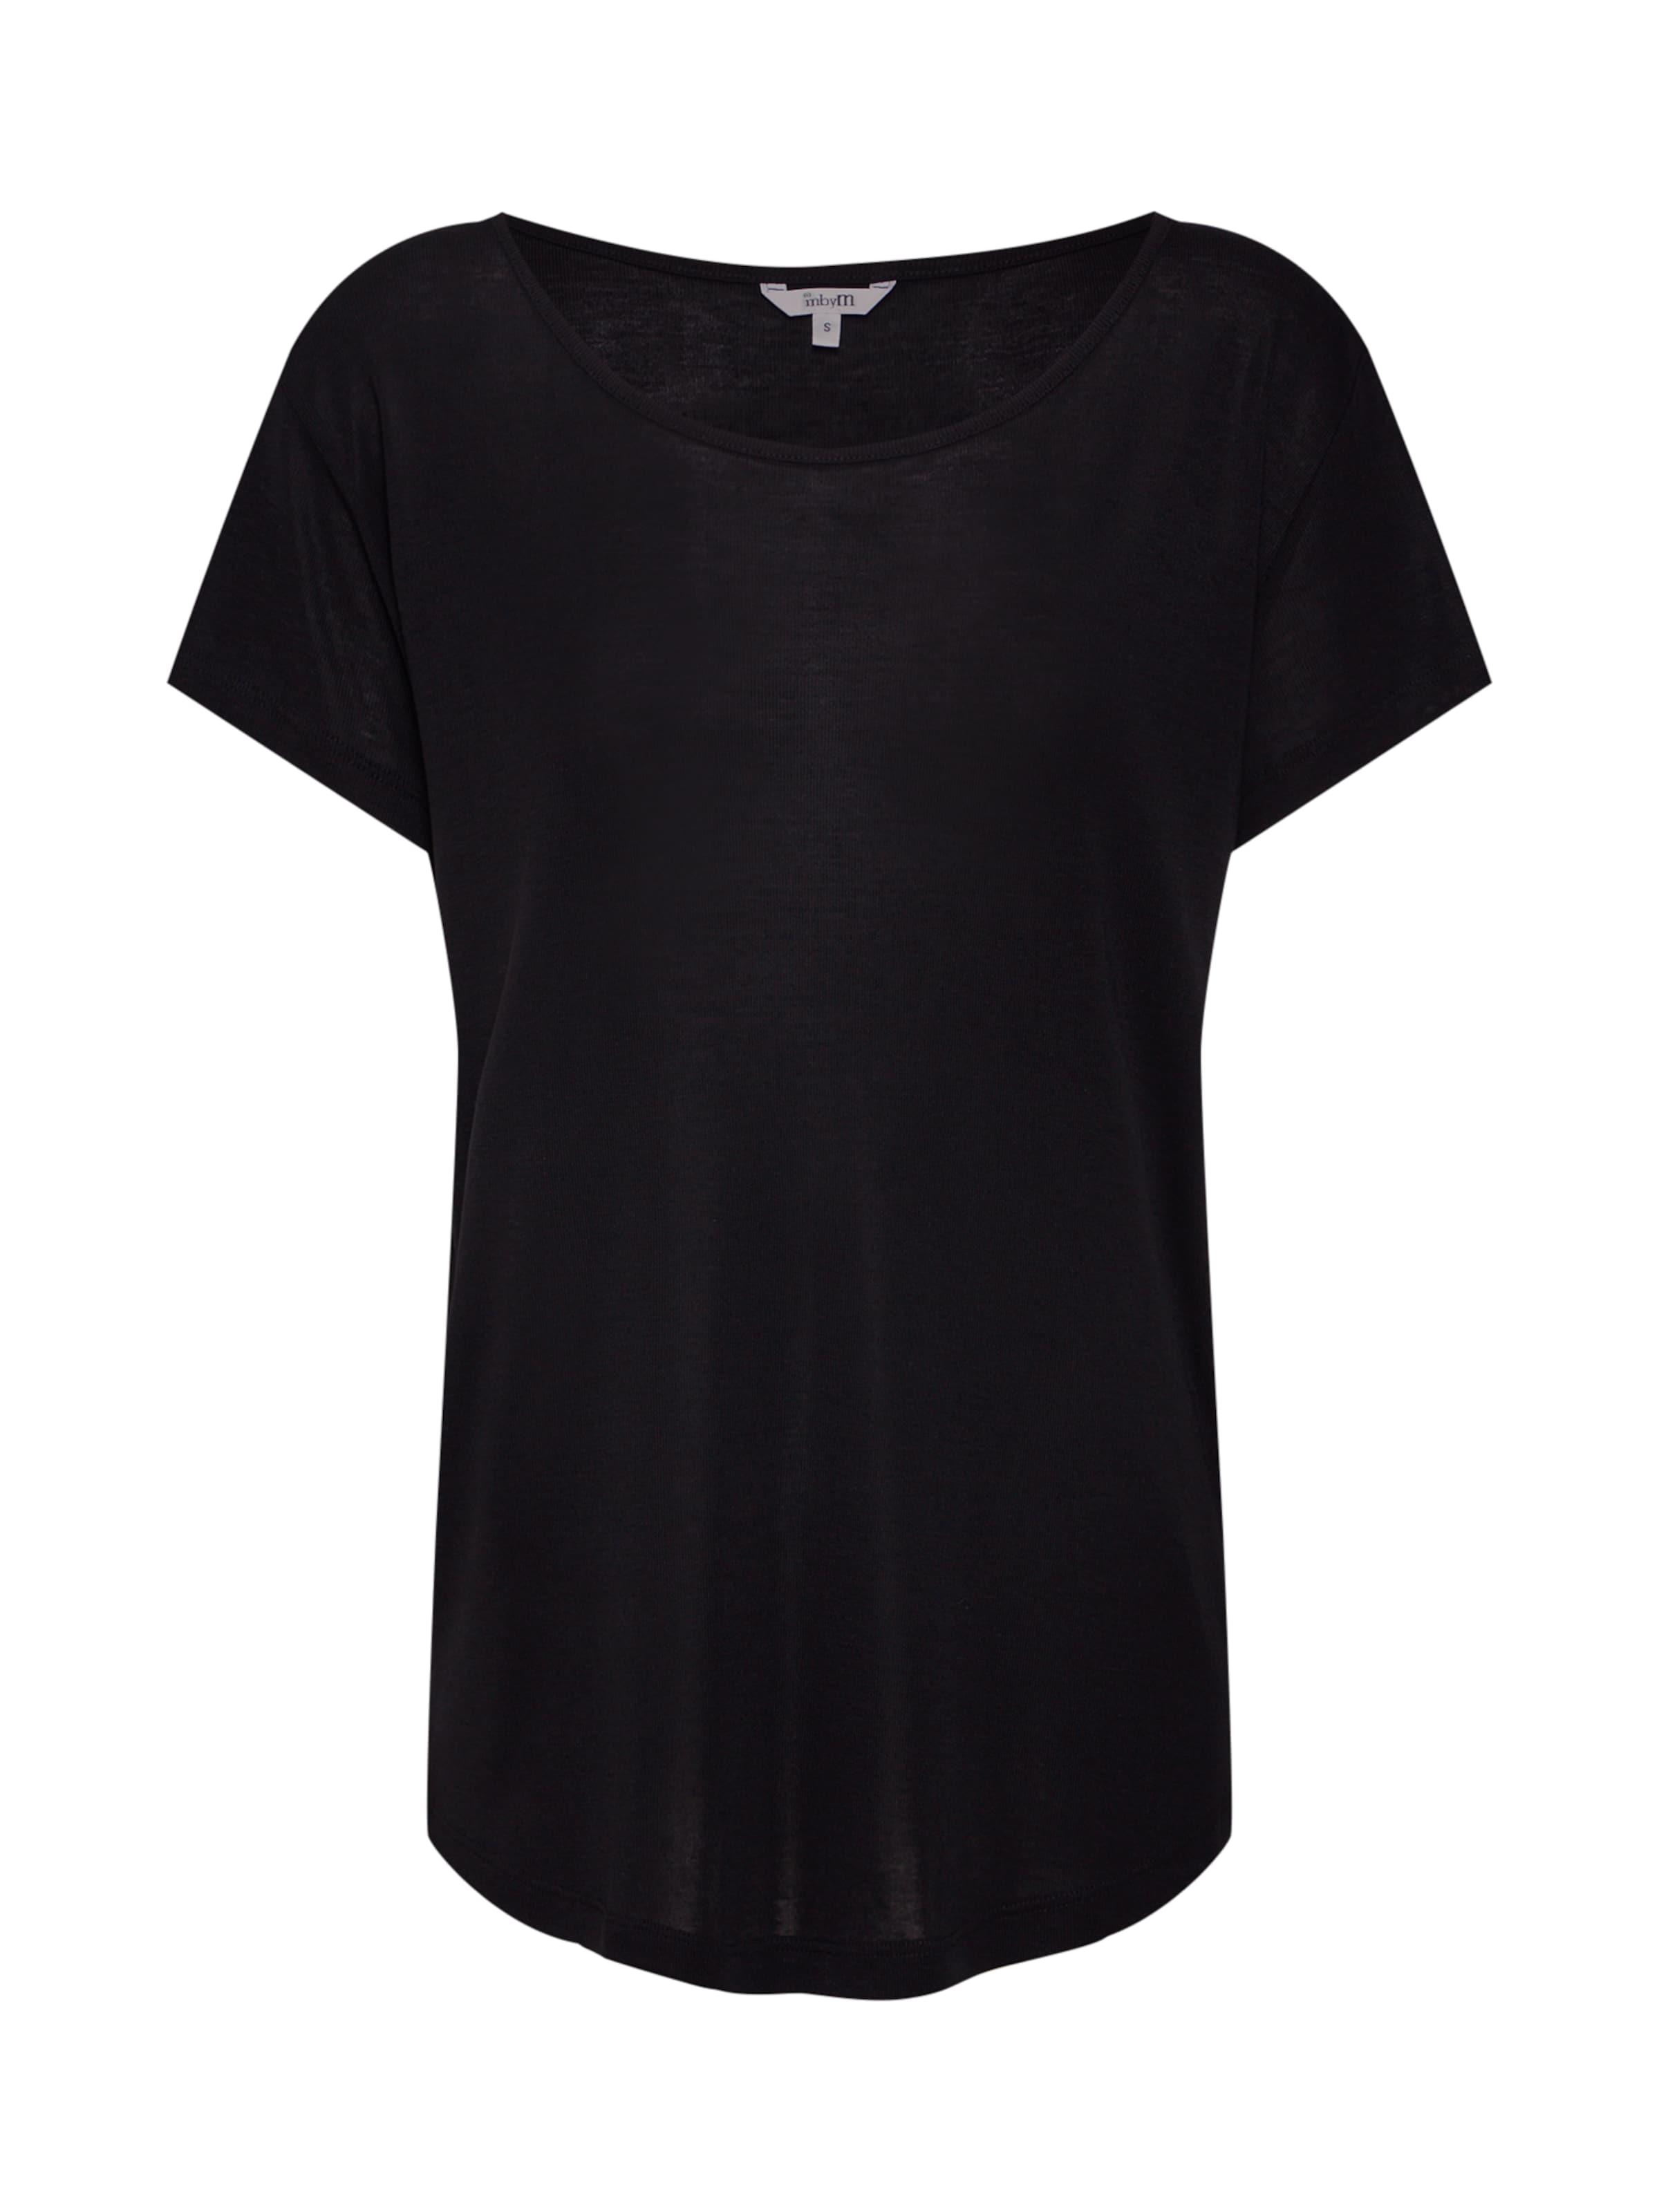 'lucianna' MbymT MbymT shirt shirt In Rose 'lucianna' In shirt Rose MbymT ymnN0wOv8P